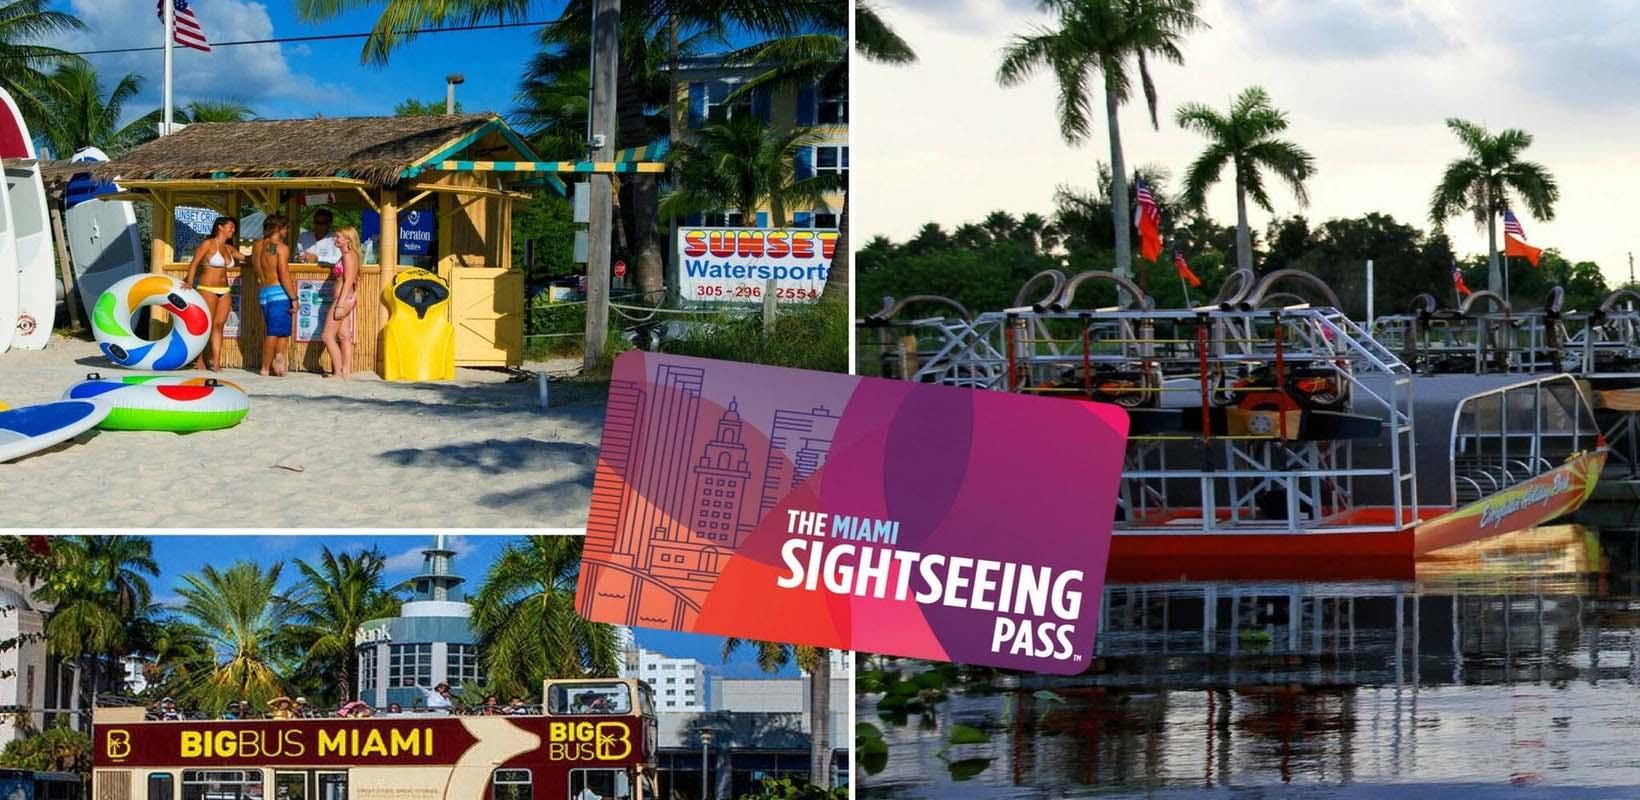 Miami Sightseeing FLEX Pass